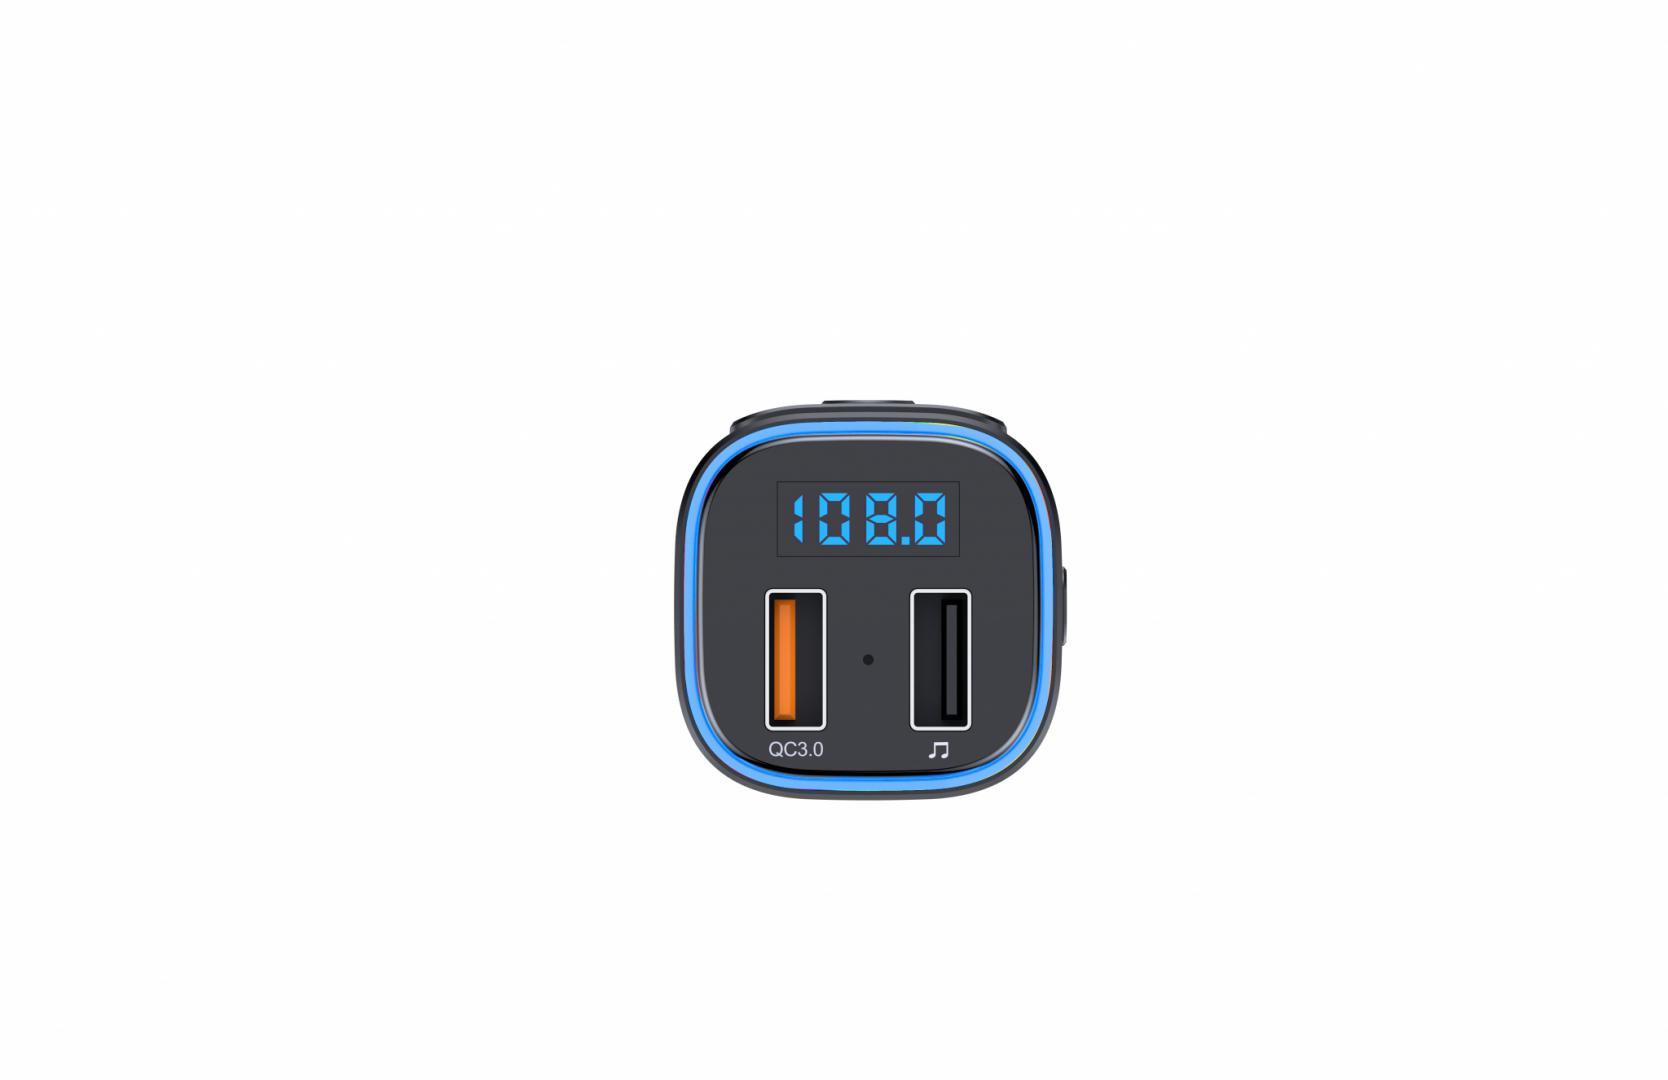 Modulator FM Serioux ABFM46, Bluetooth 5.0 , raza actiune de până la 5 m, voltaj intrare: 1x DC 12V/24V, 2 porturi USB: 1 X USB QC3.0 1 x USB audio (pana la 32 GB), format muzica: MP3/WMA/WAV, frecvența FM: 87.5MHz - 108.0MHZ , microfon incorporat, functii:răspunde/respinge/handsfree/reapelare - imaginea 3